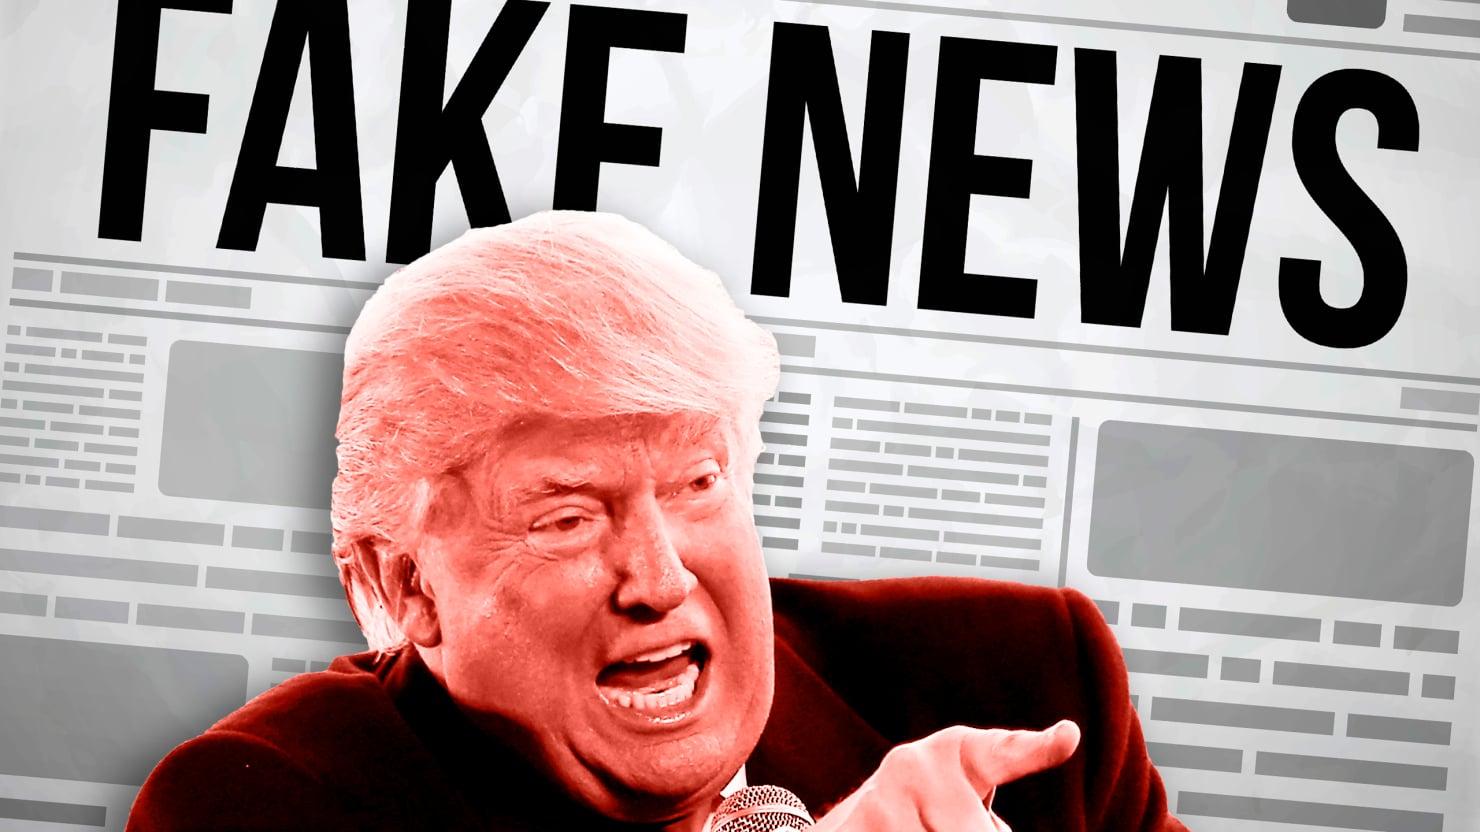 Трамп обрадовался провалу CNN. Фото: thedailybeast.com